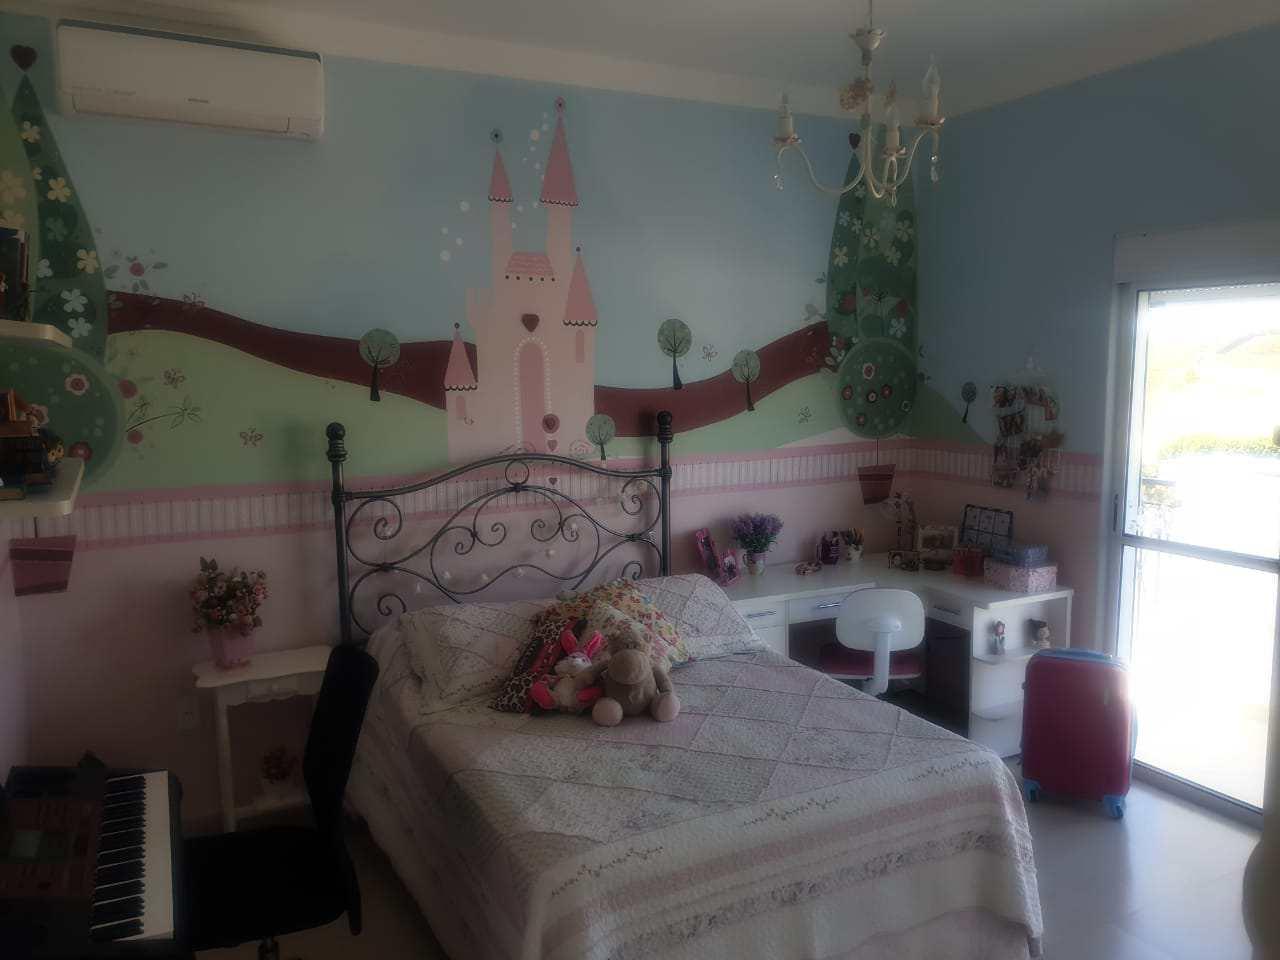 Casa com 3 dorms, Monte Líbano, Santa Rita do Sapucaí - R$ 1.3 mi, Cod: 193